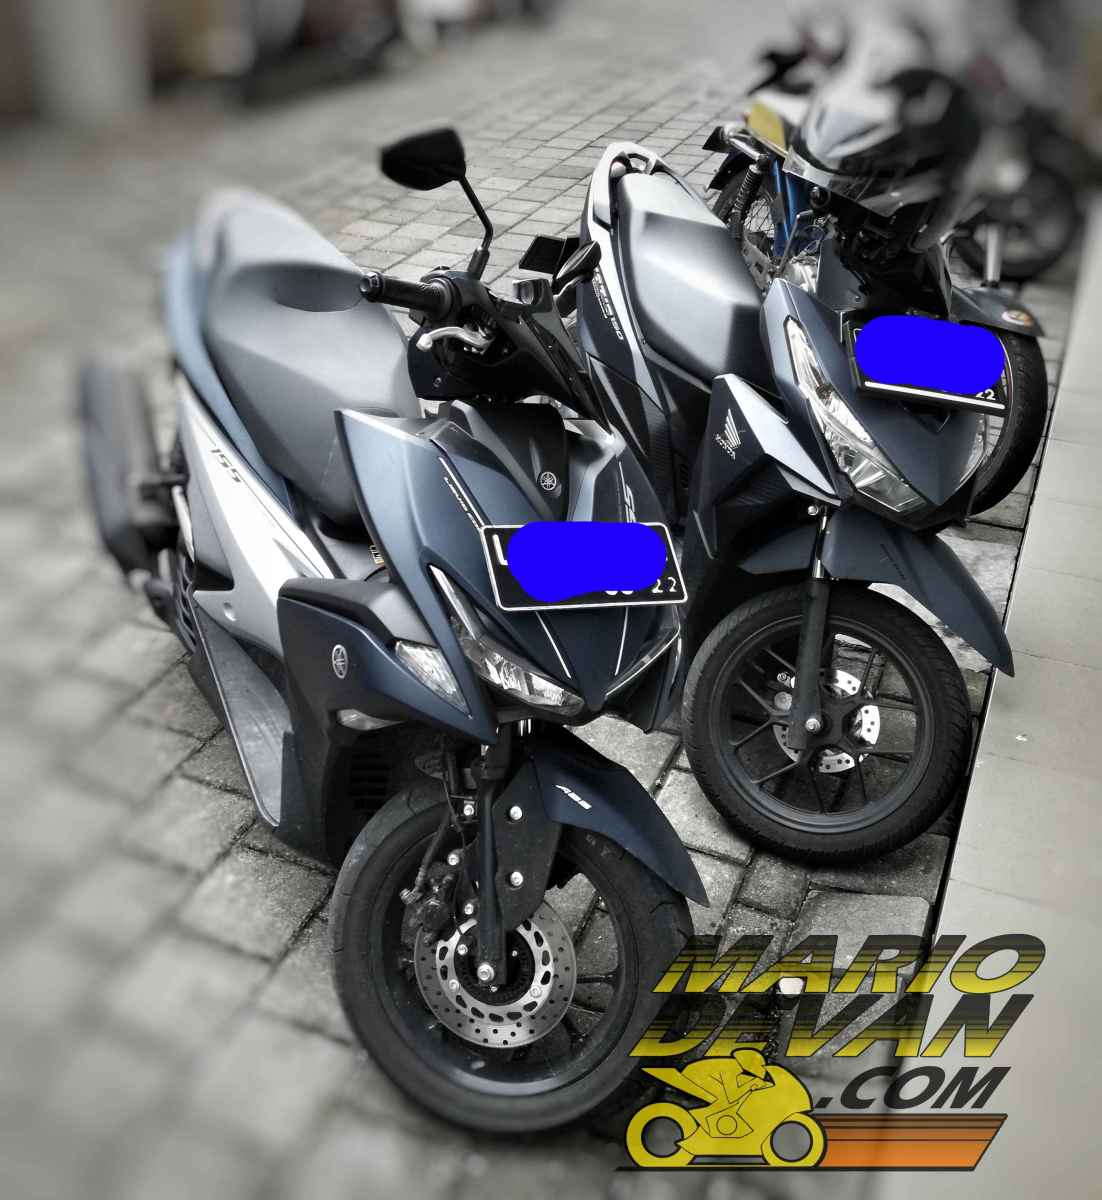 Yamaha Aerox 155 Vs Honda Vario 150 Pilih Mana Mario Devan Blogs